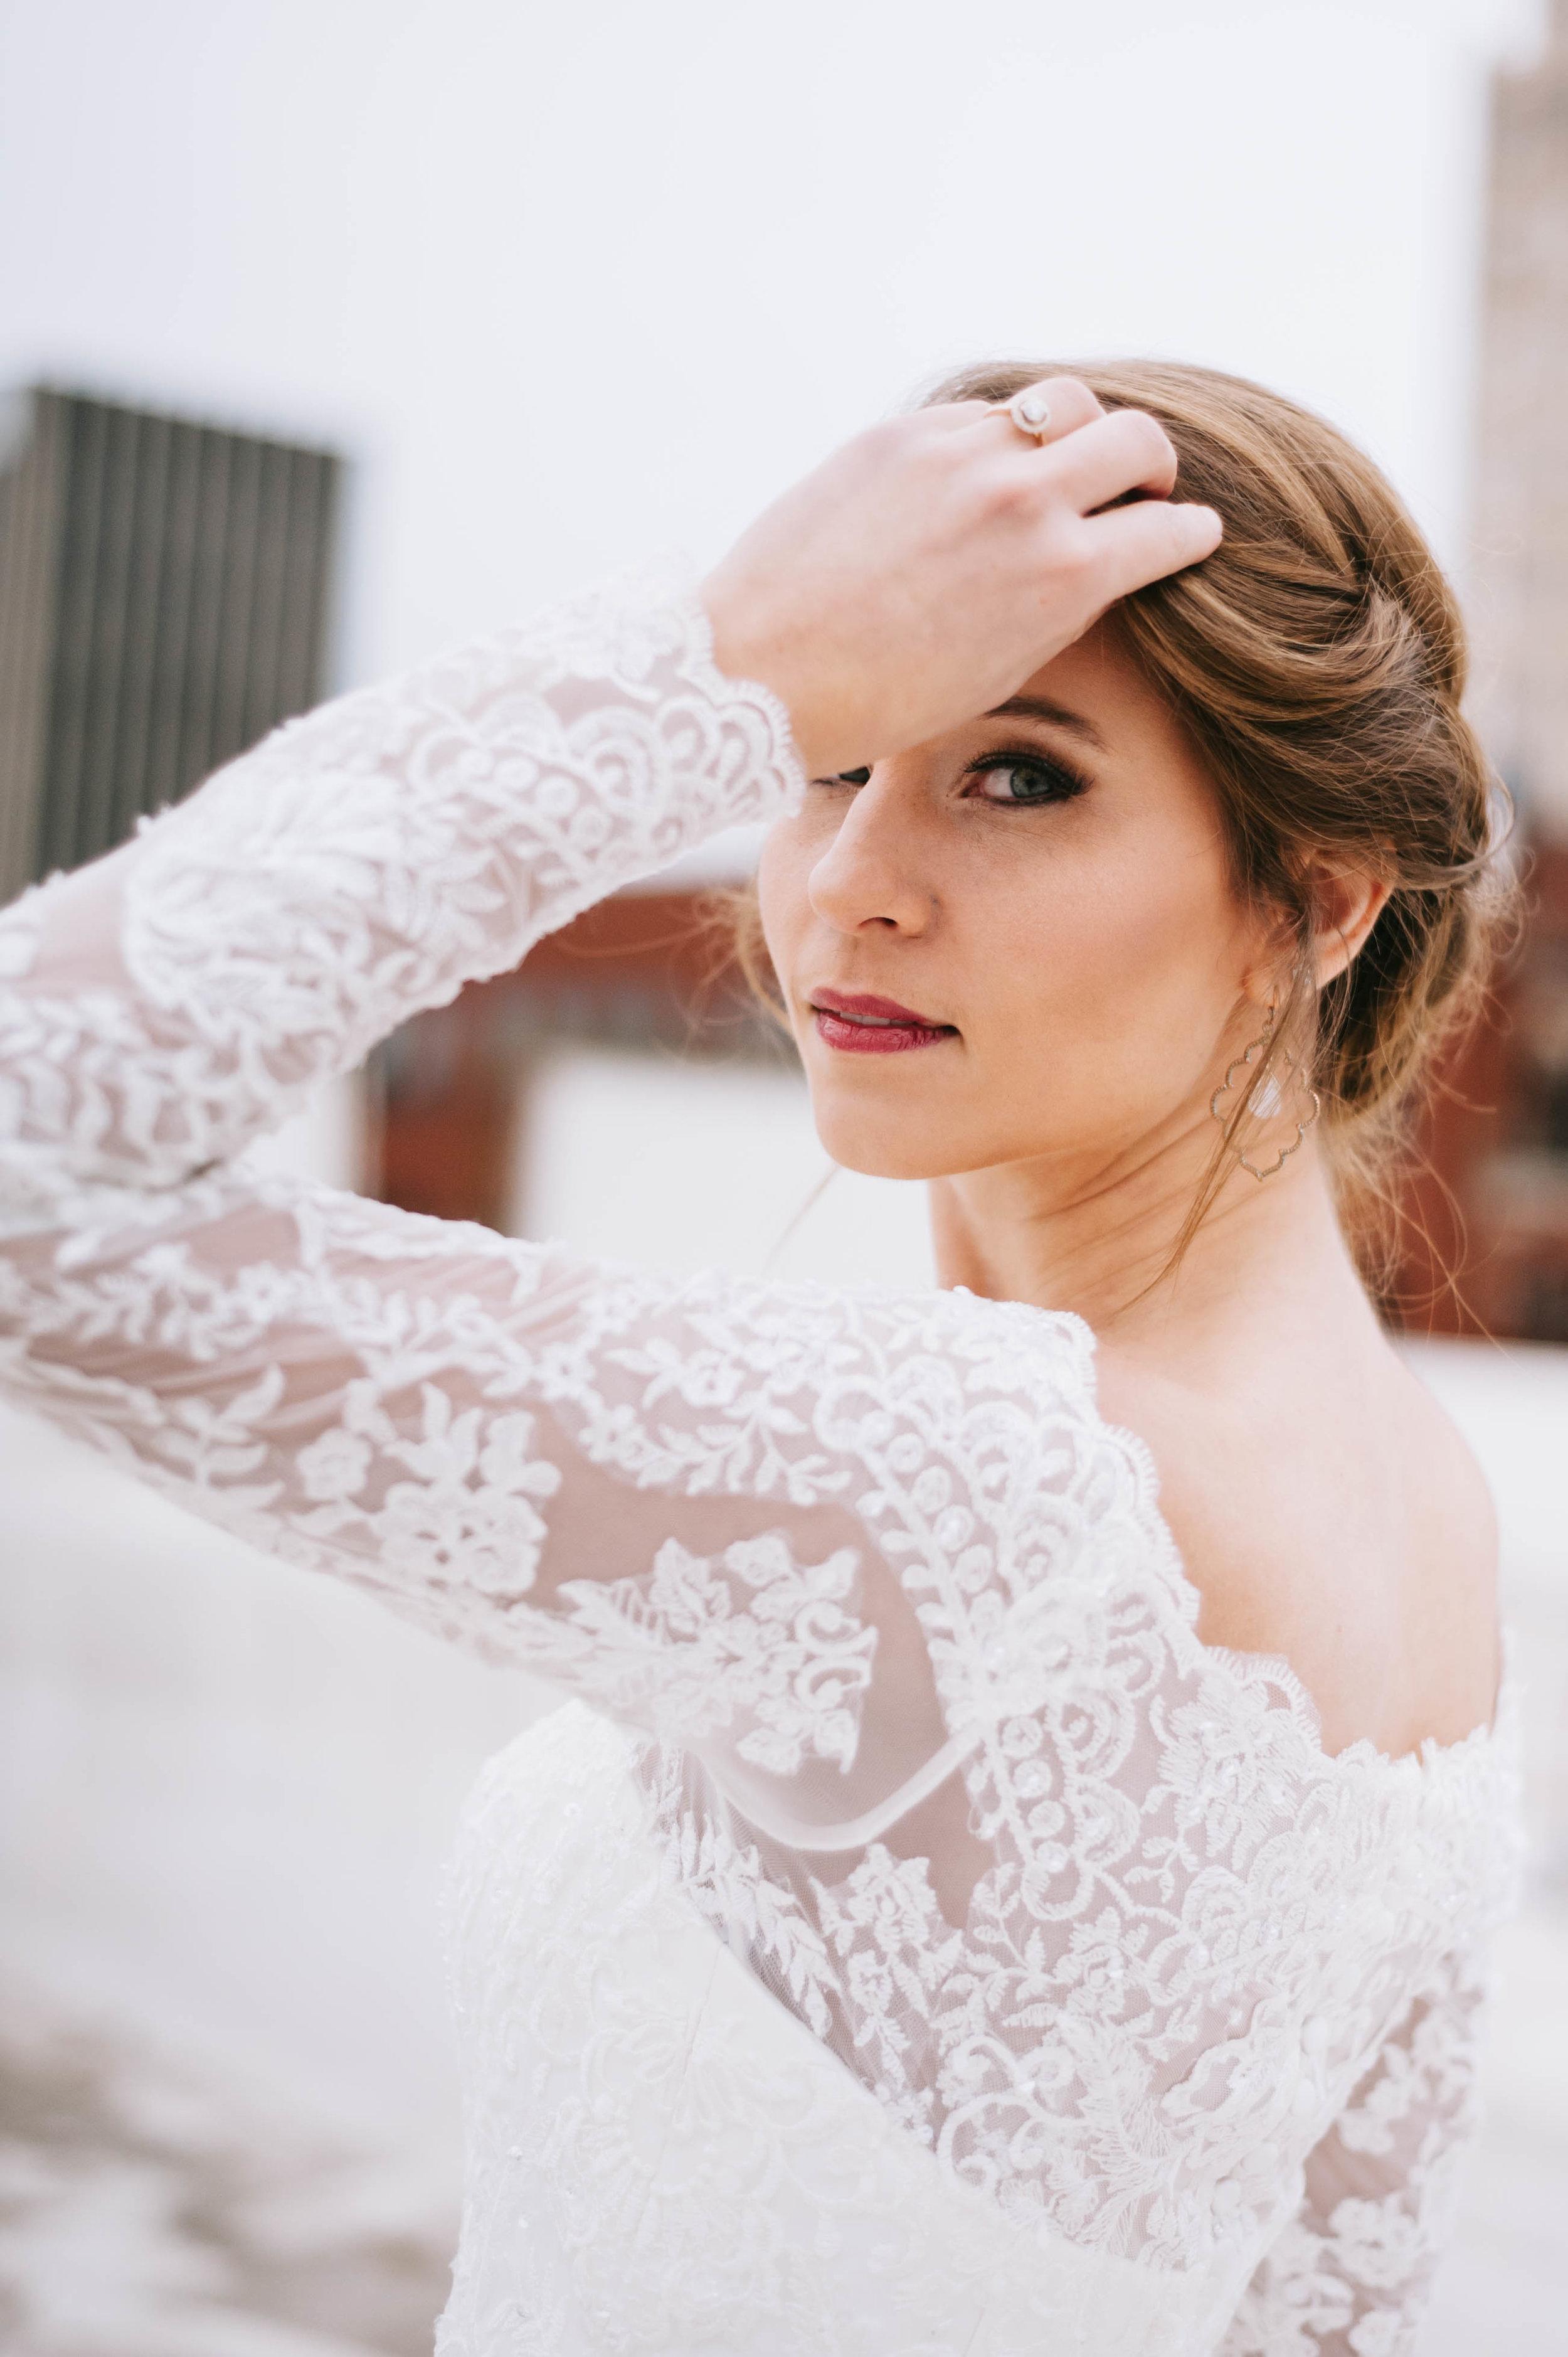 Hannah Steward Baskin | Bridals (62 of 74).jpg